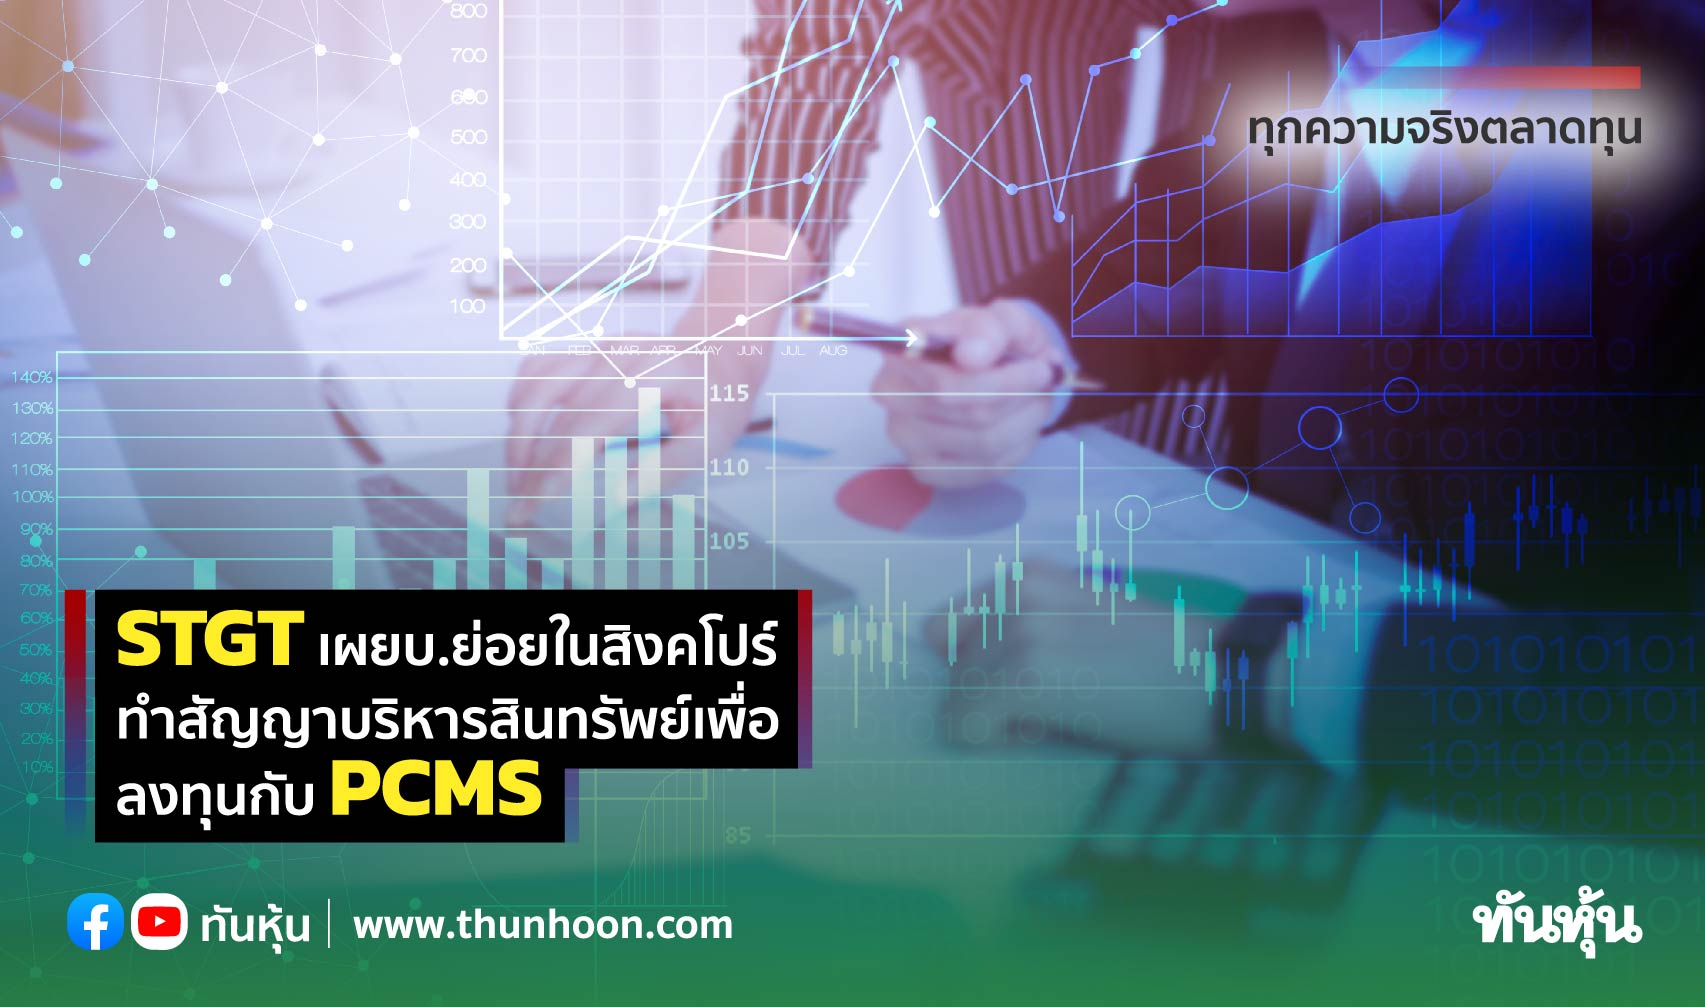 STGT เผยบ.ย่อยในสิงคโปร์ทำสัญญาบริหารสินทรัพย์เพื่อลงทุนกับ PCMS